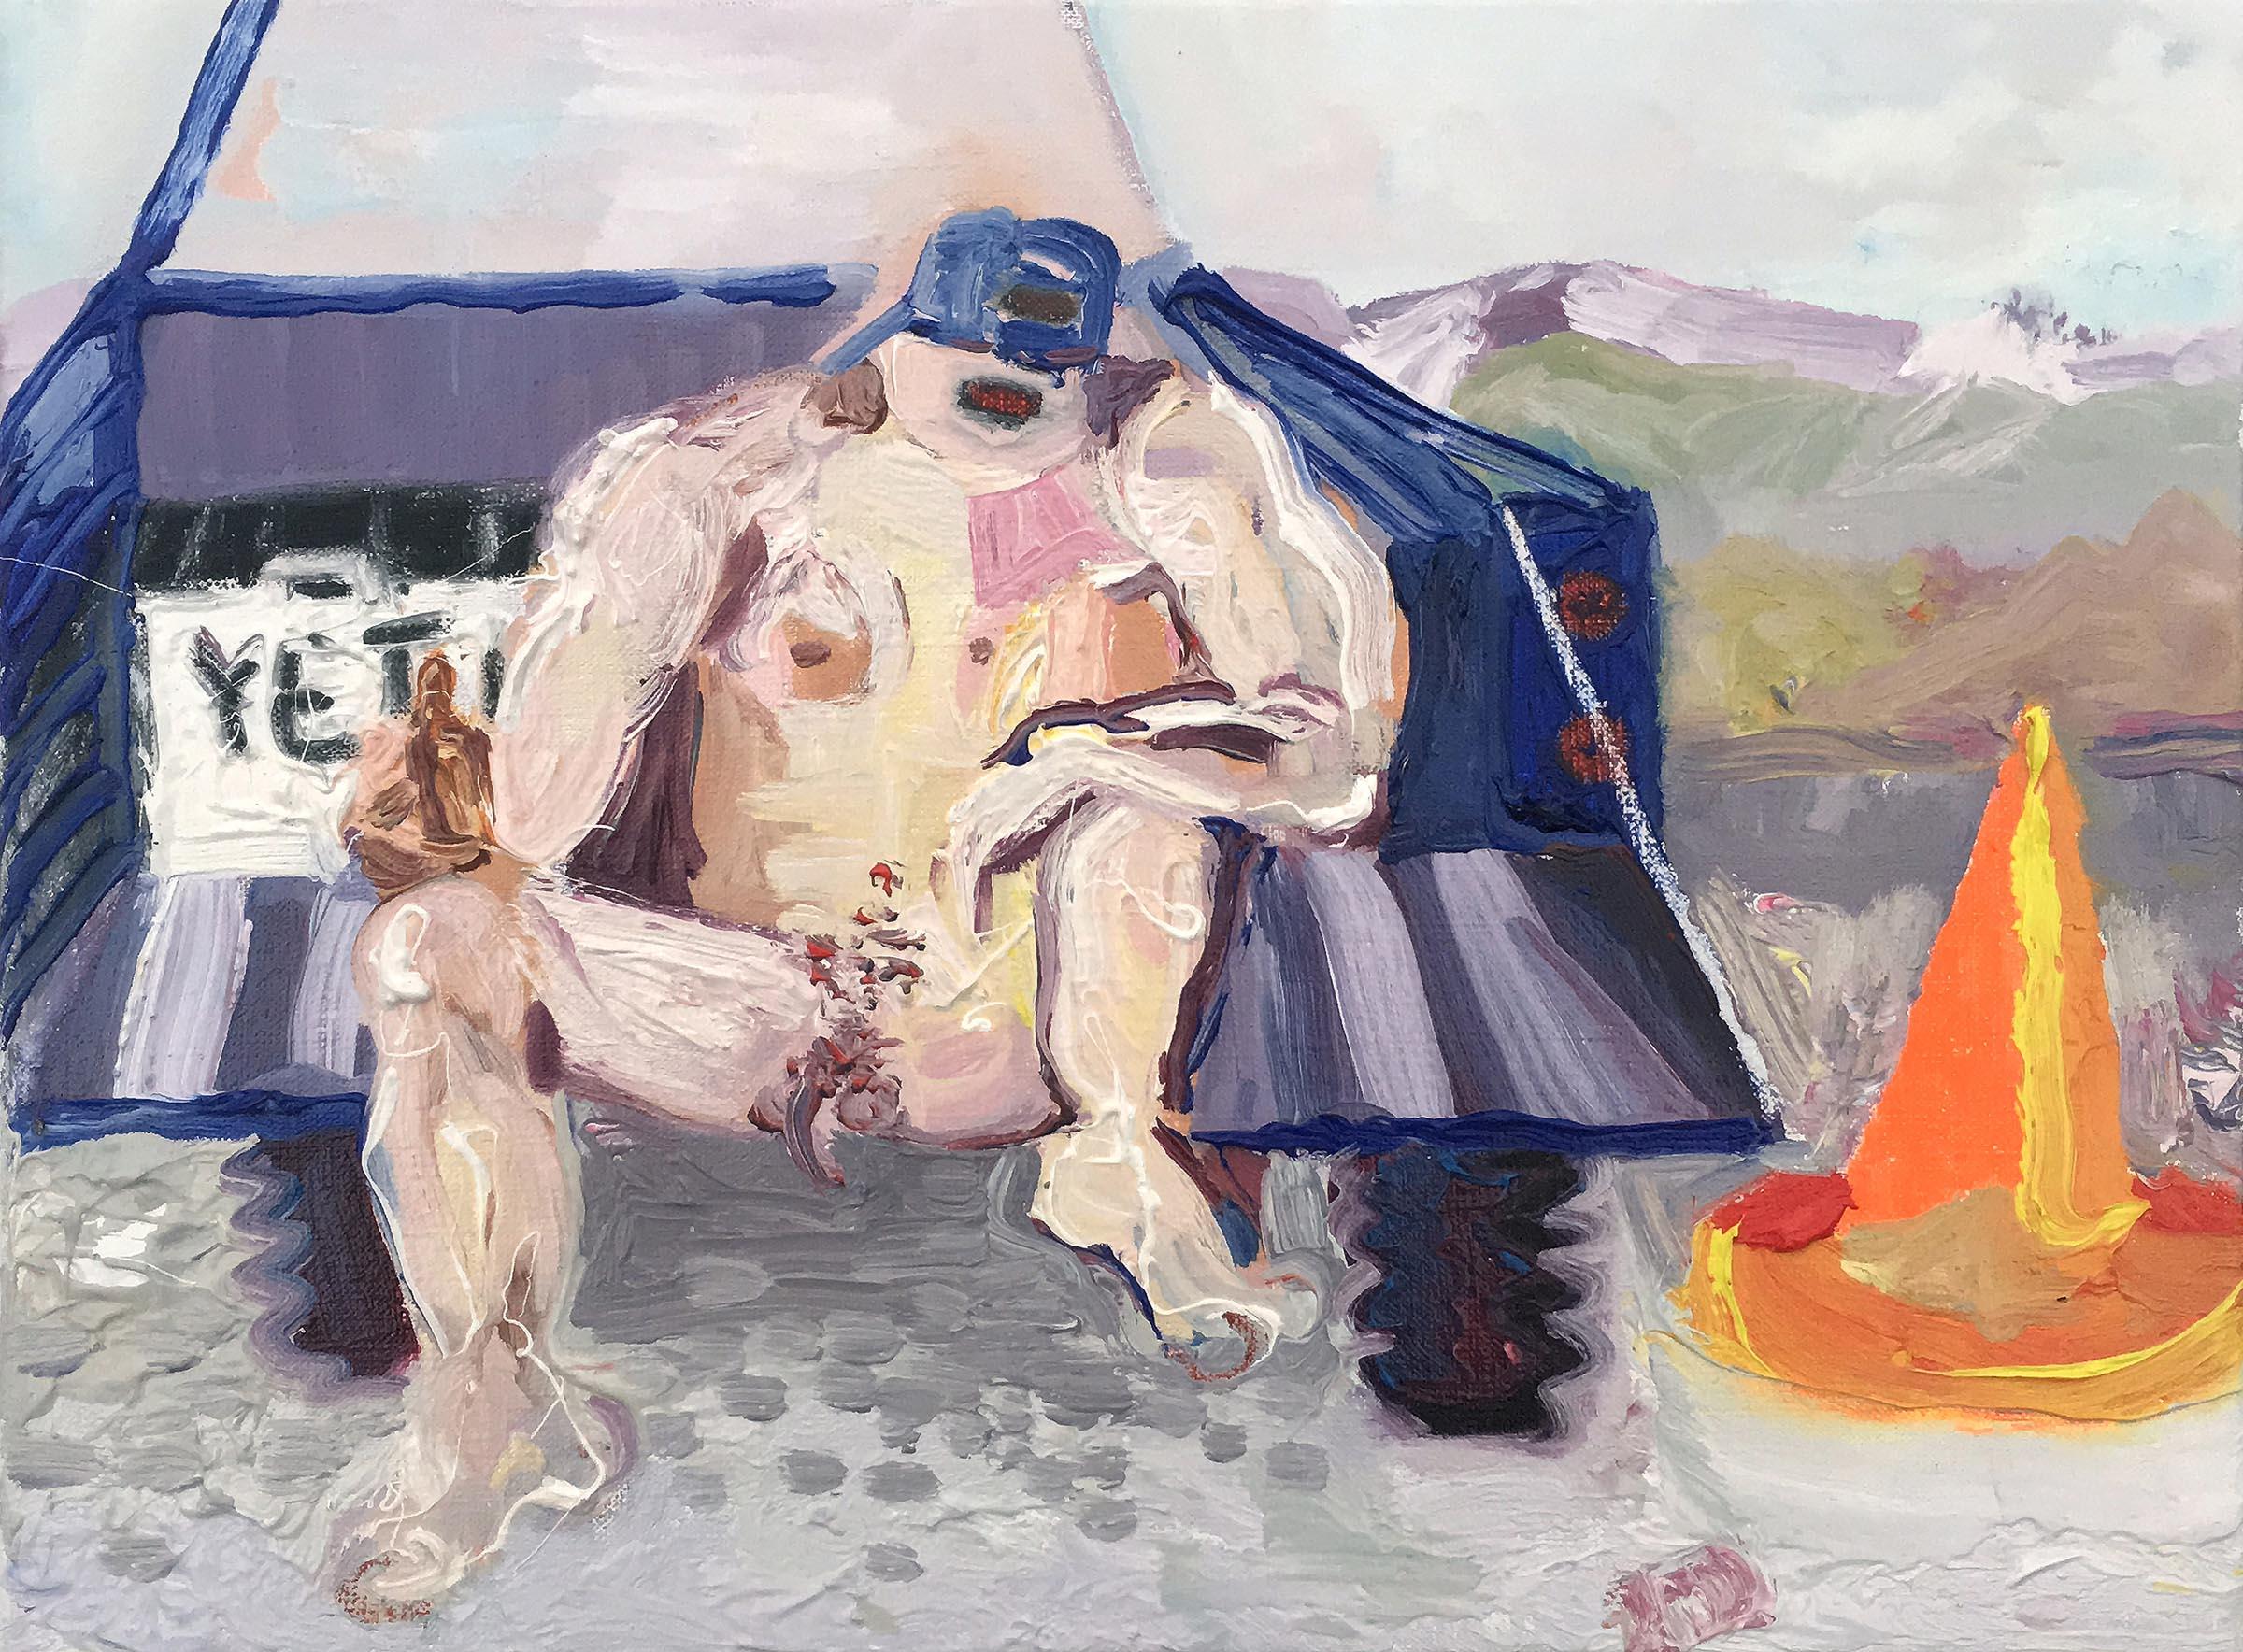 Vivian Liddell, artist's portfolio